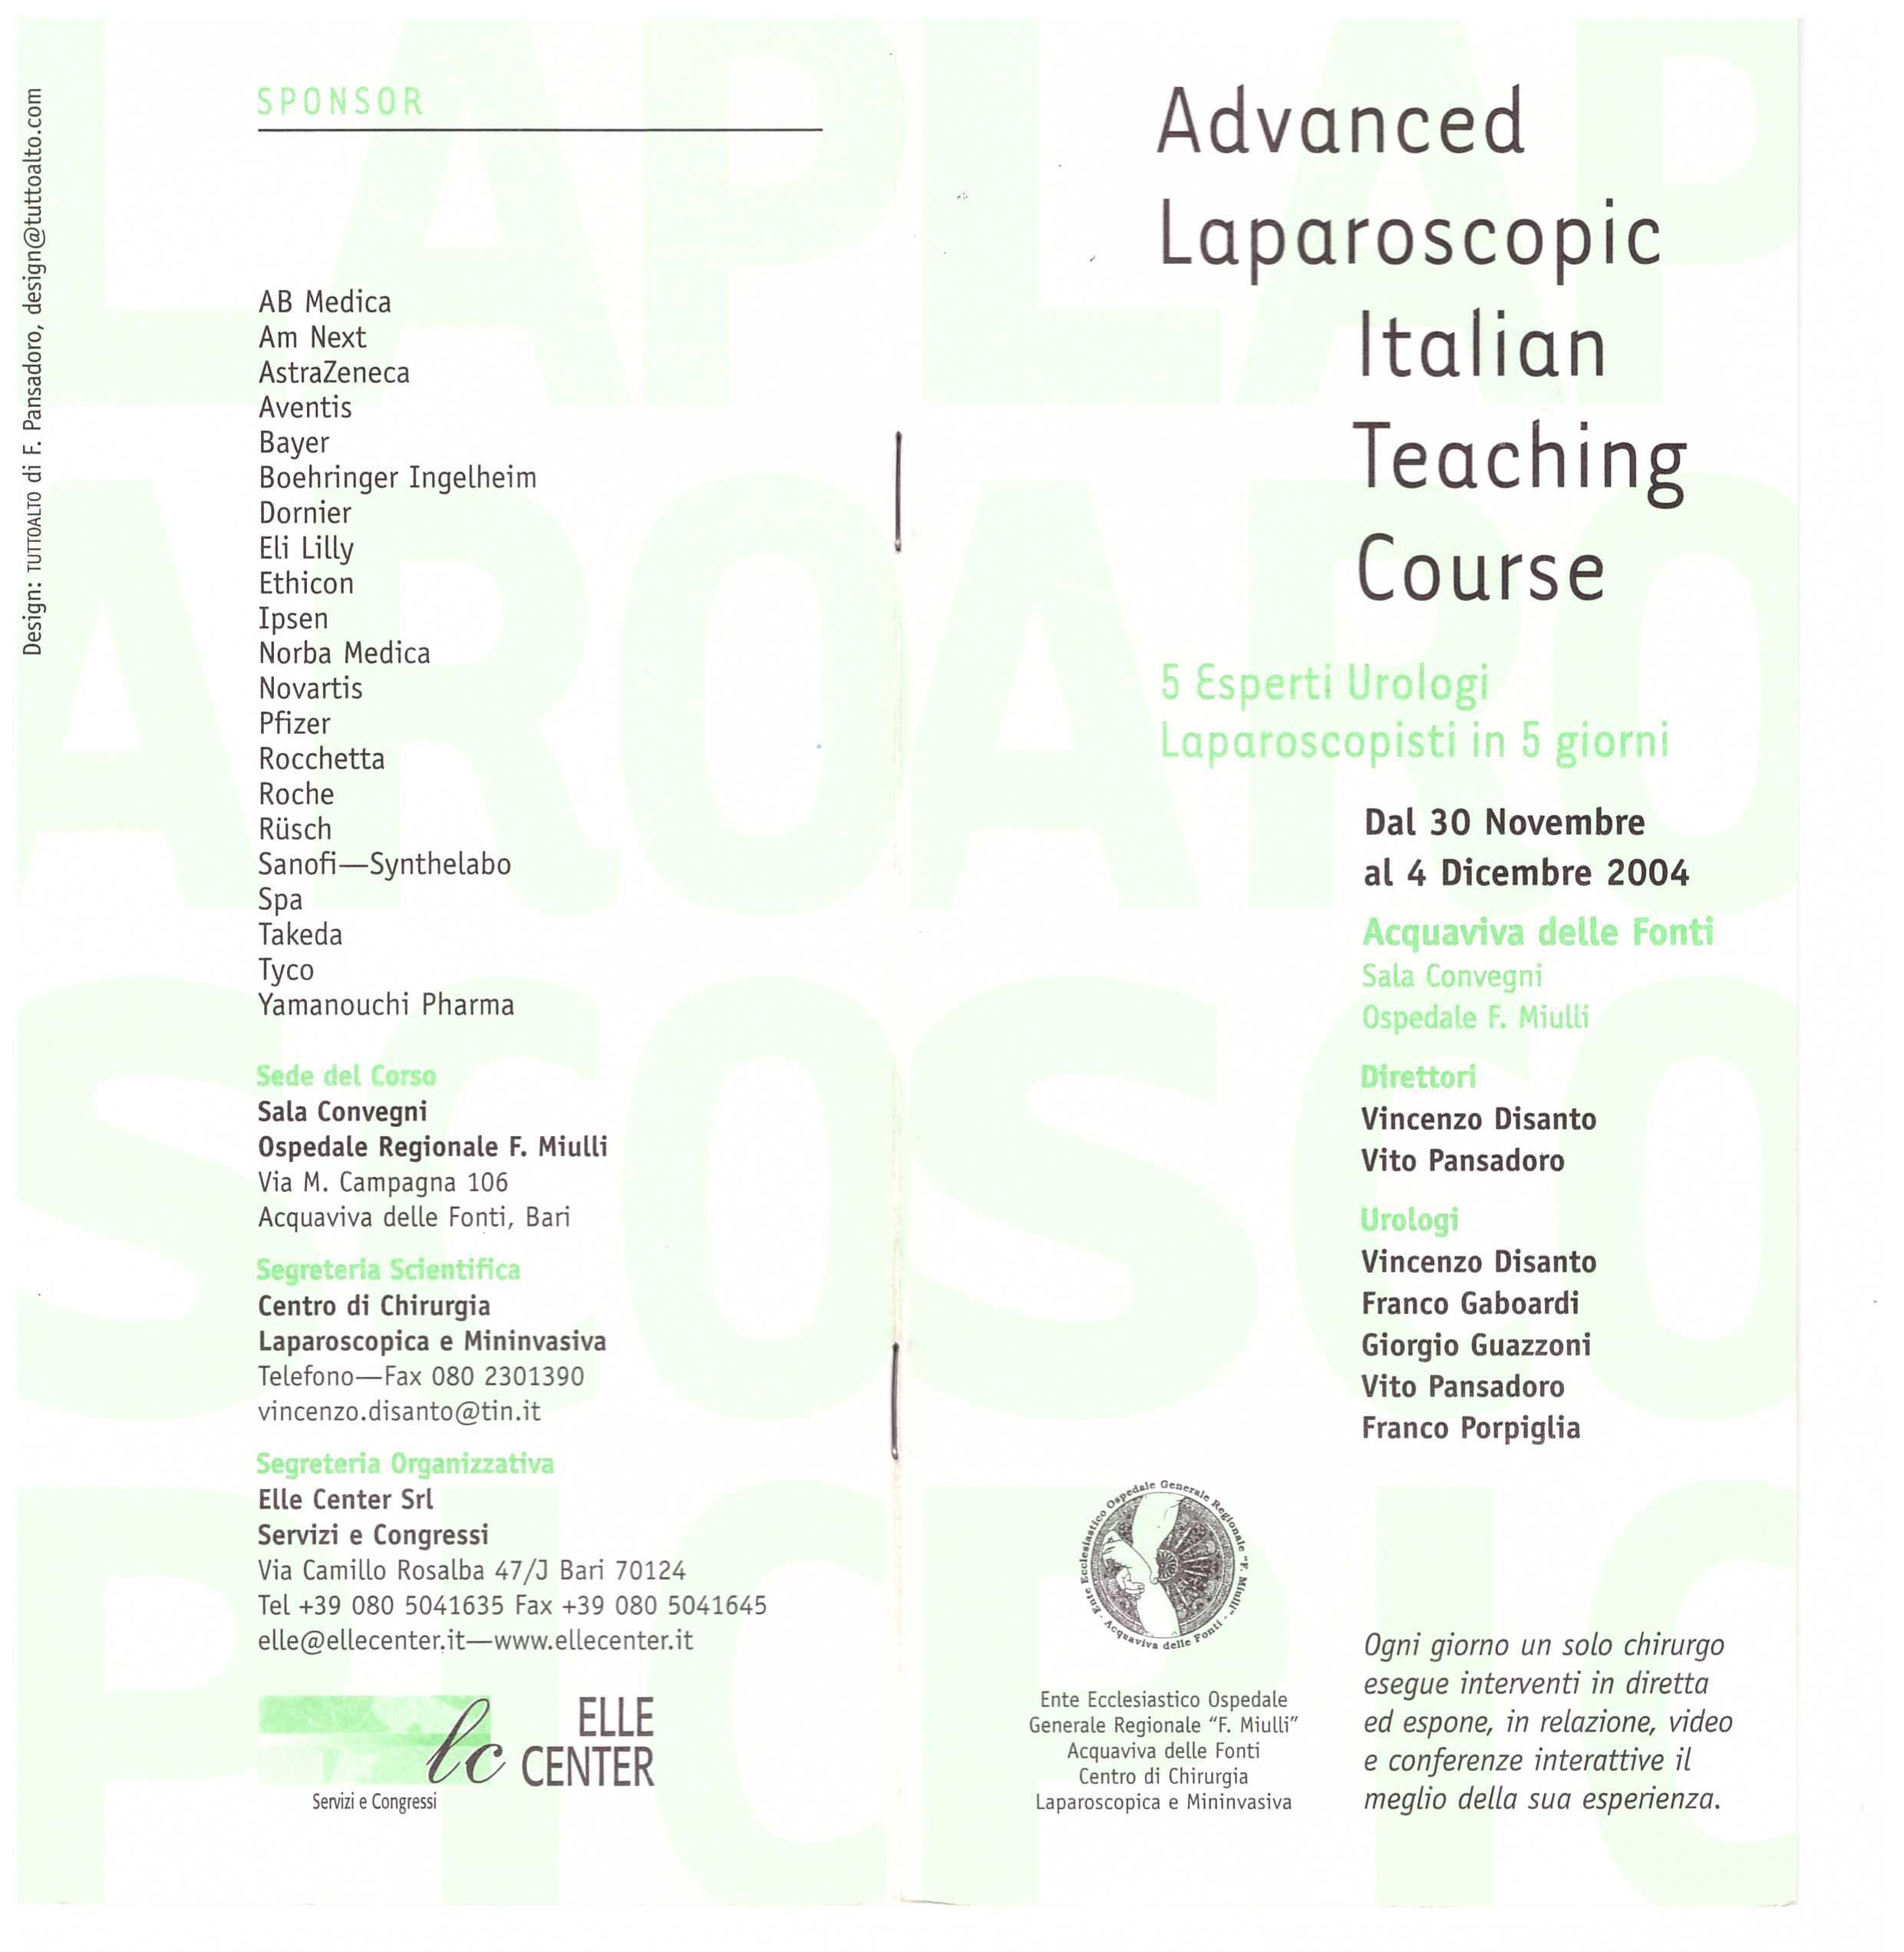 ADVANCED-LAPAROSCOPIC-ITALIAN-TEACHING-COURSE